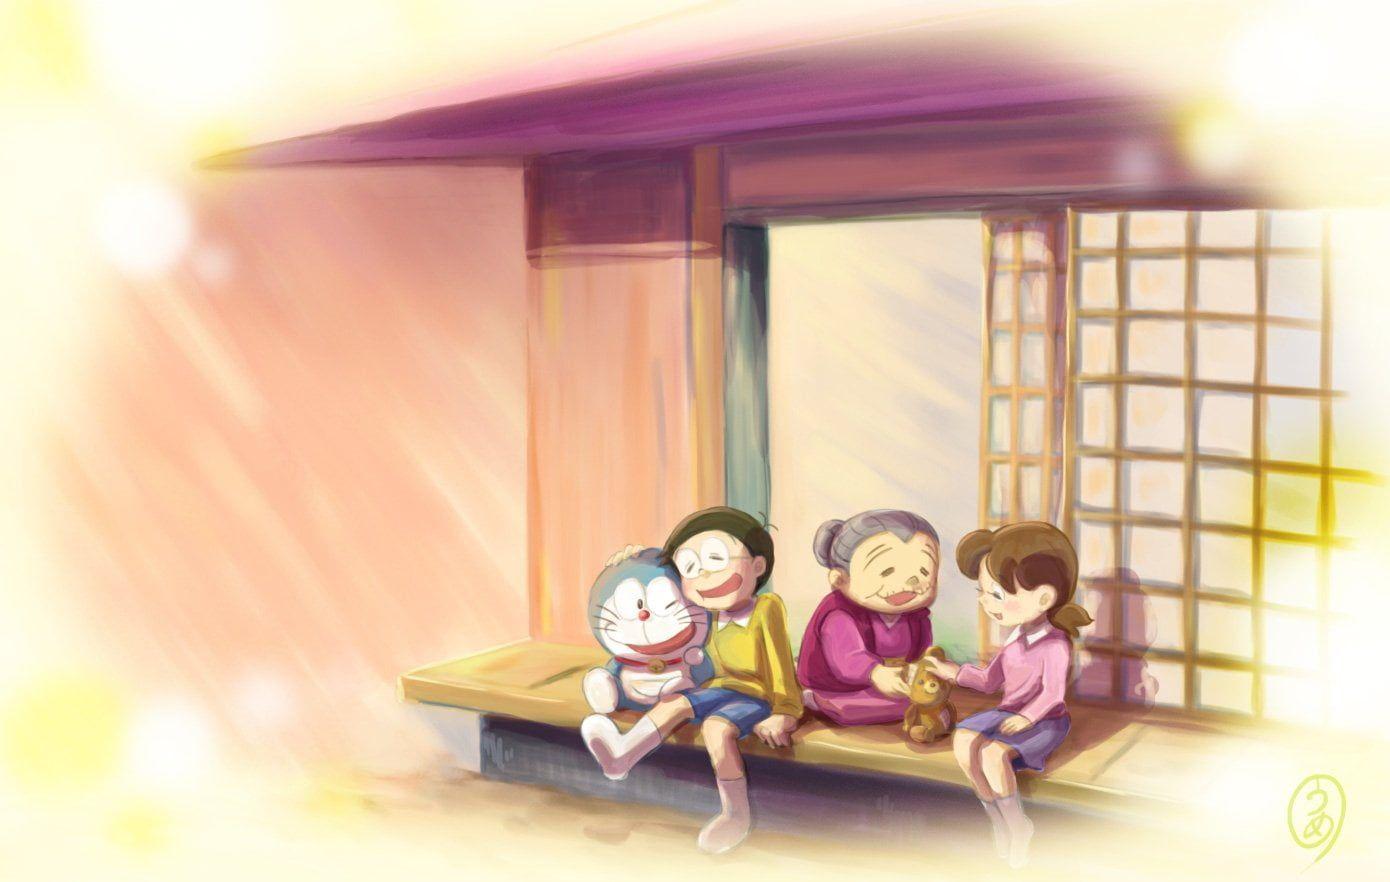 HD wallpaper: Anime, Doraemon, childhood, women, sitting, offspring, girls